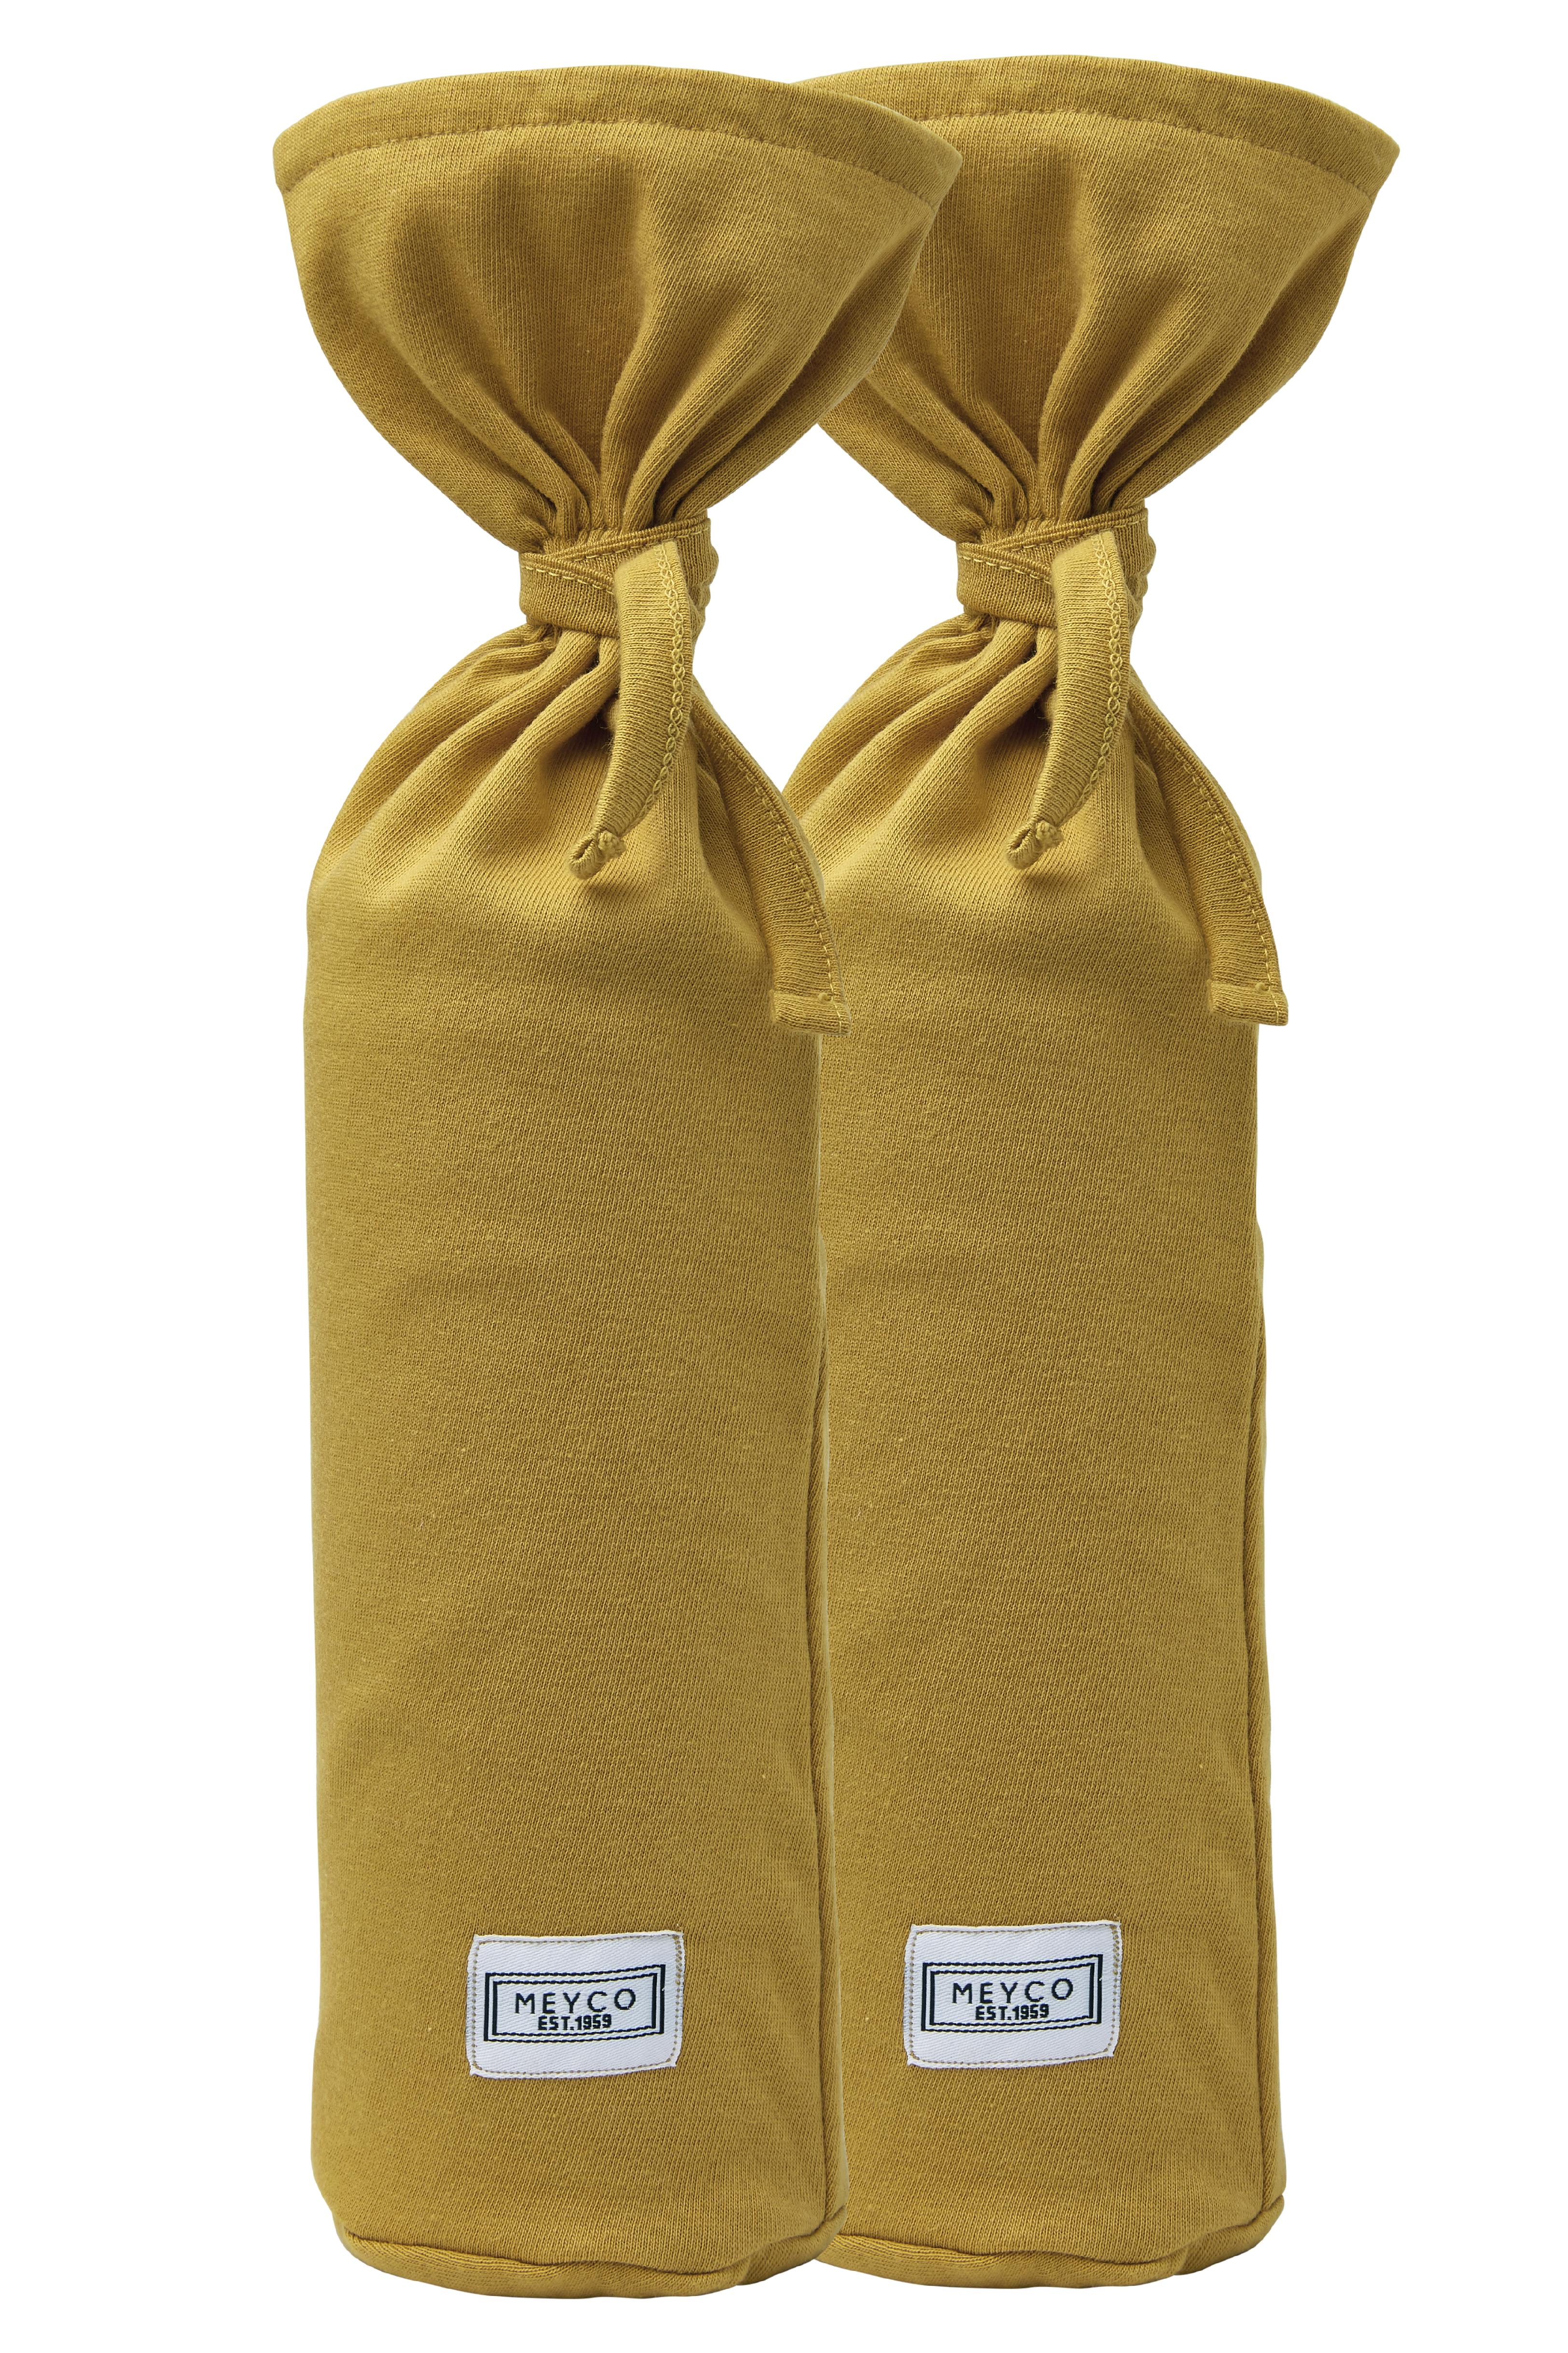 Kruikenzak 2-Pack Basic Jersey - Honey Gold - 13xh35cm